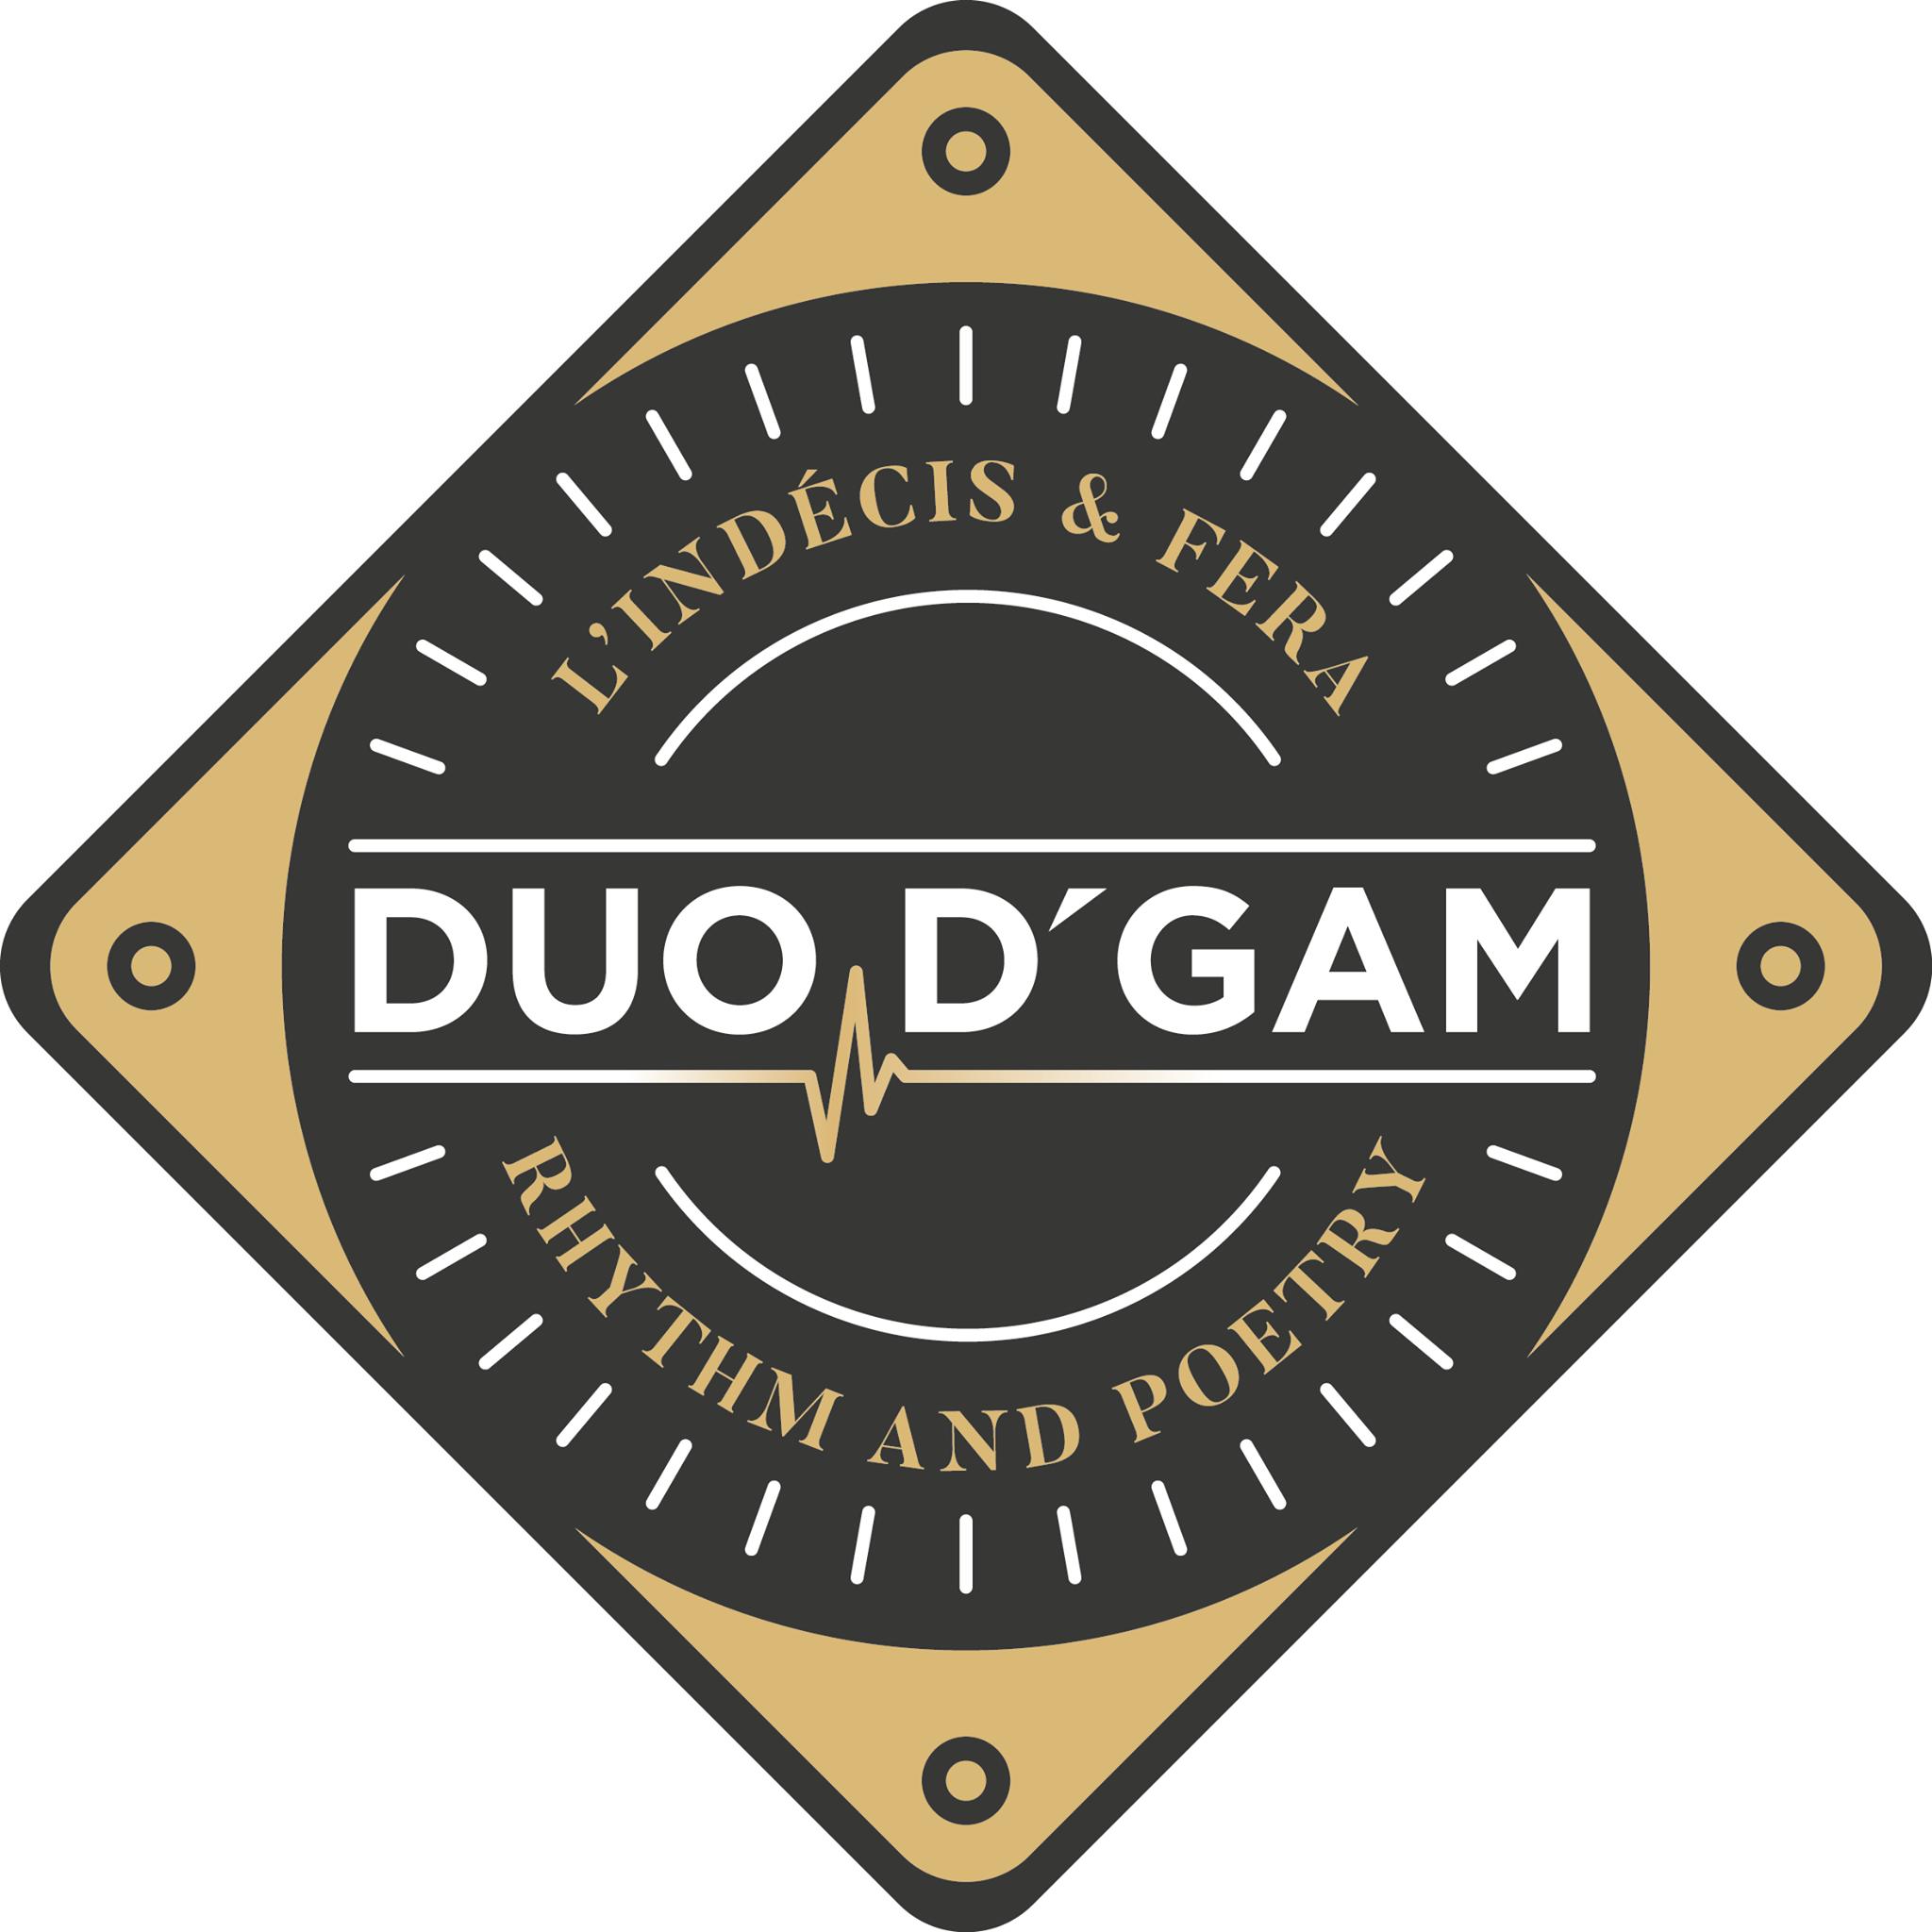 [re]PREZENT – Duo D'Gam